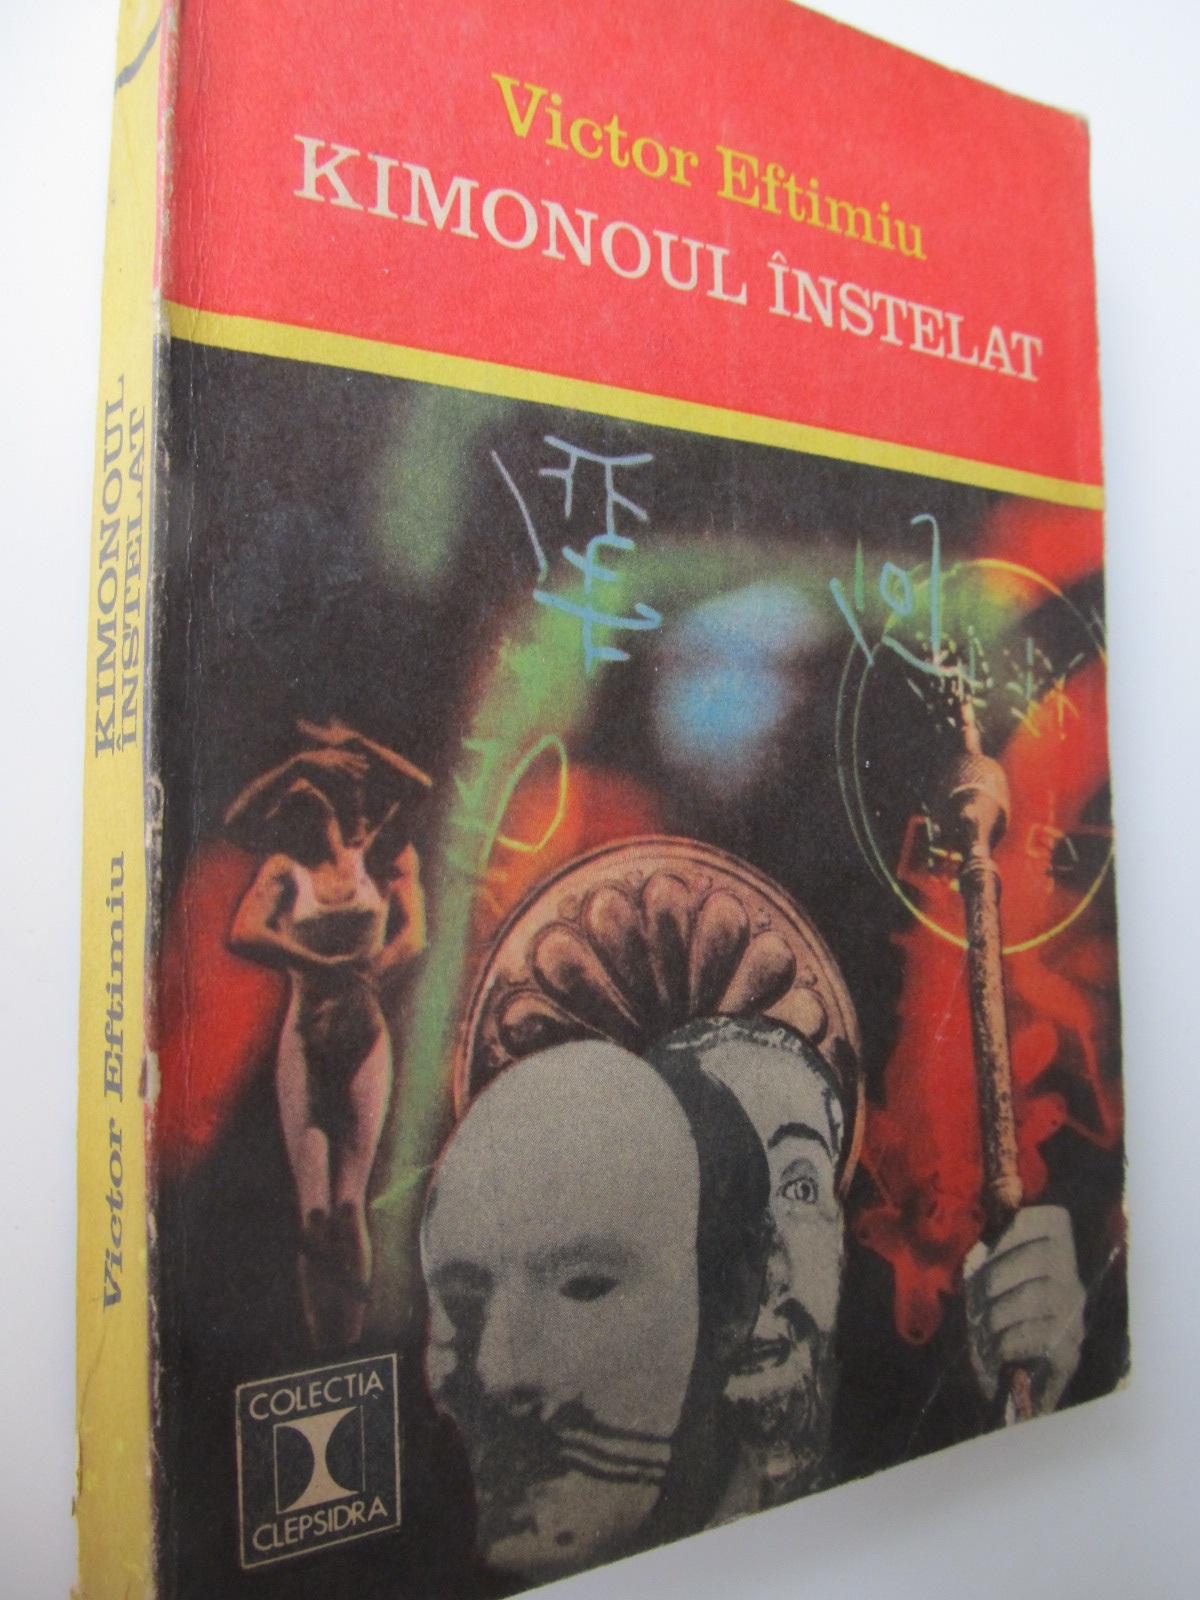 Kimonoul instelat - Victor Eftimiu   Detalii carte